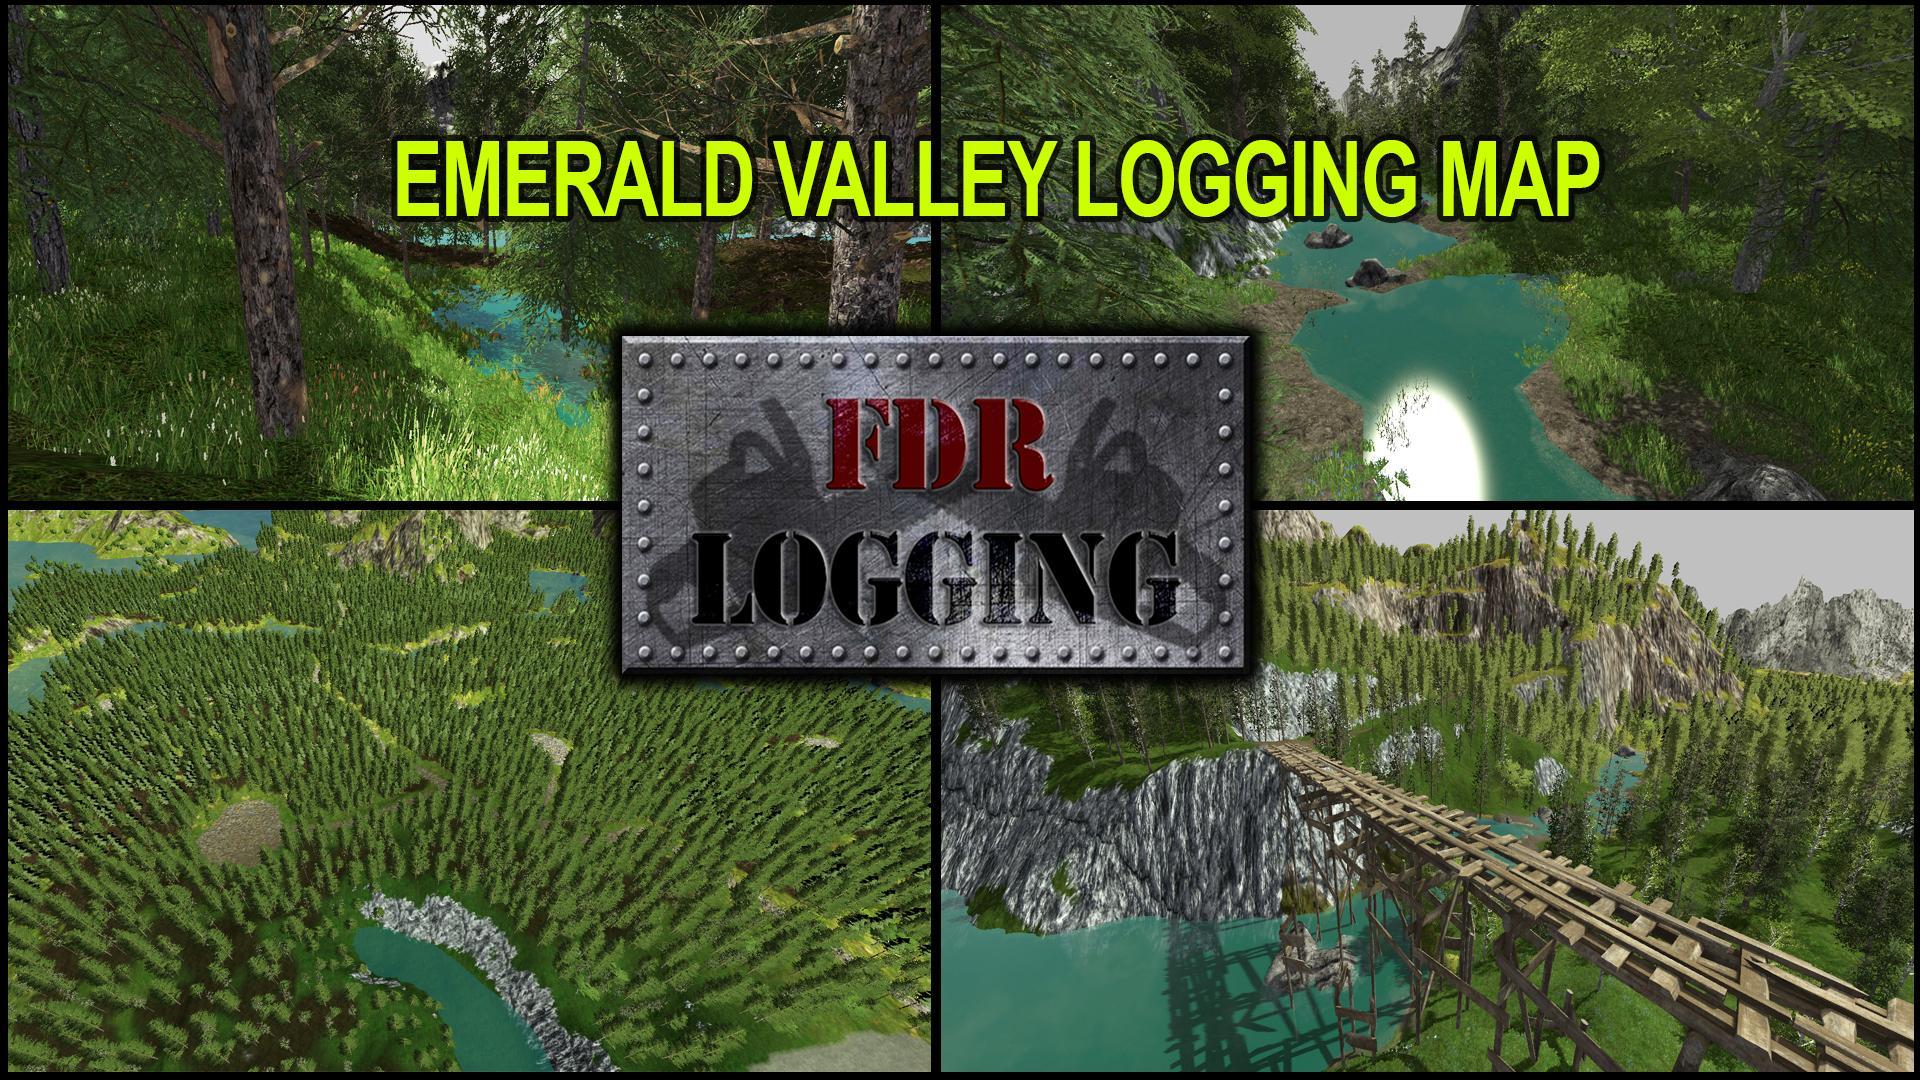 FDR Logging - Emerald Valley Logging Map